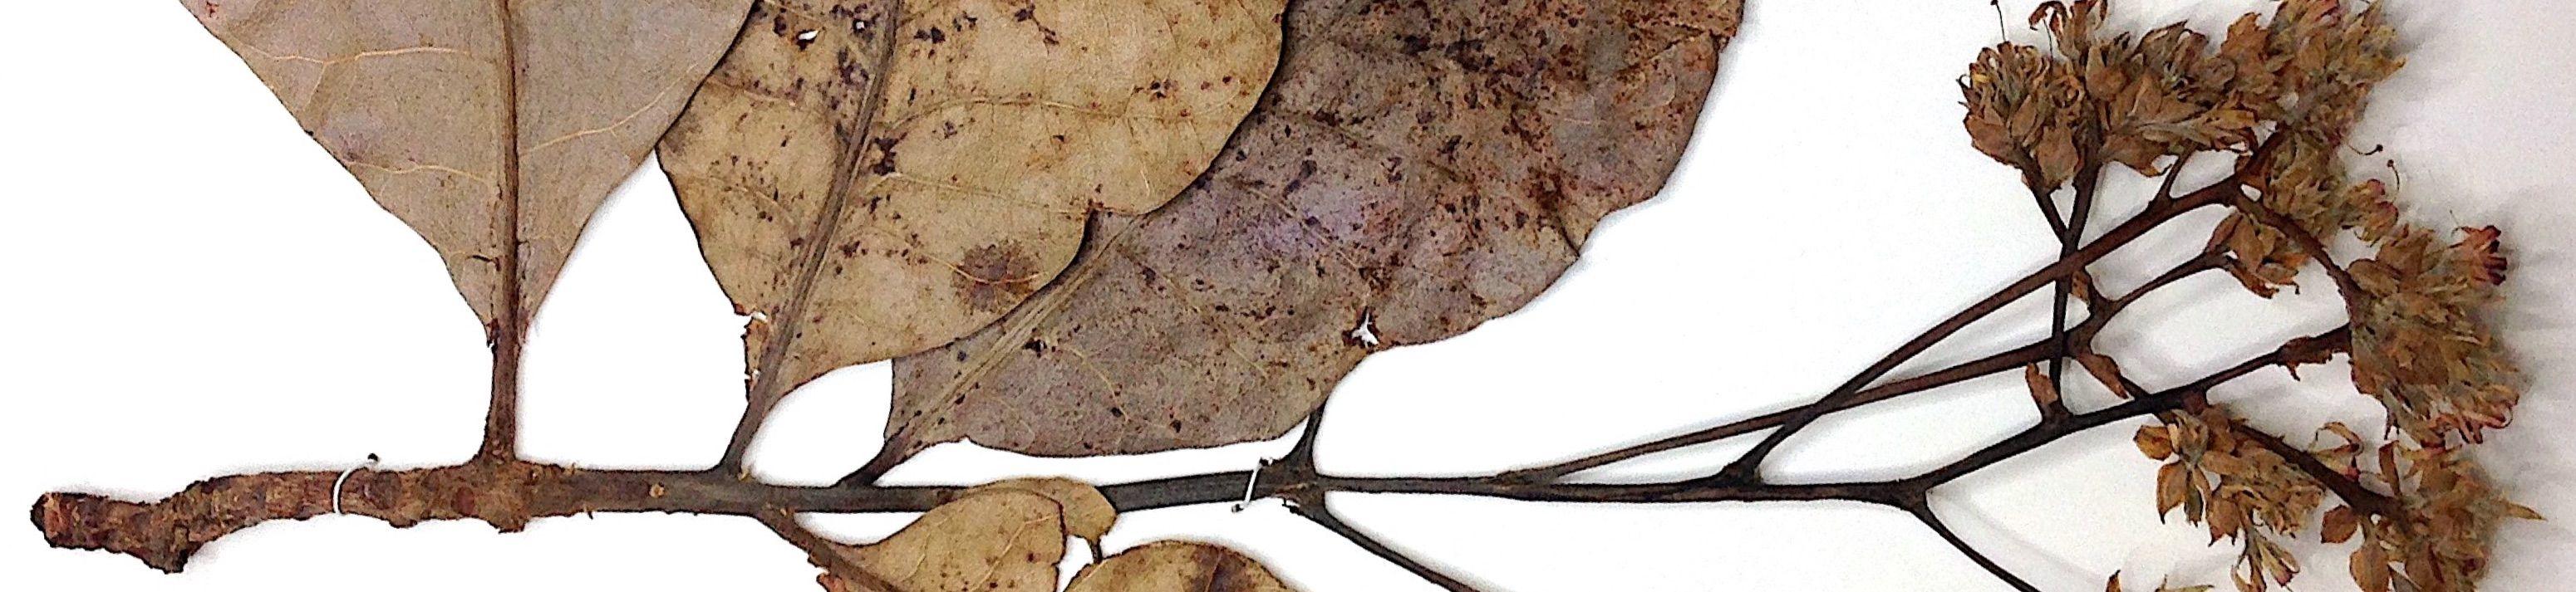 Anacardium occidentale L. Fotografia: Edson Ferreira Duarte